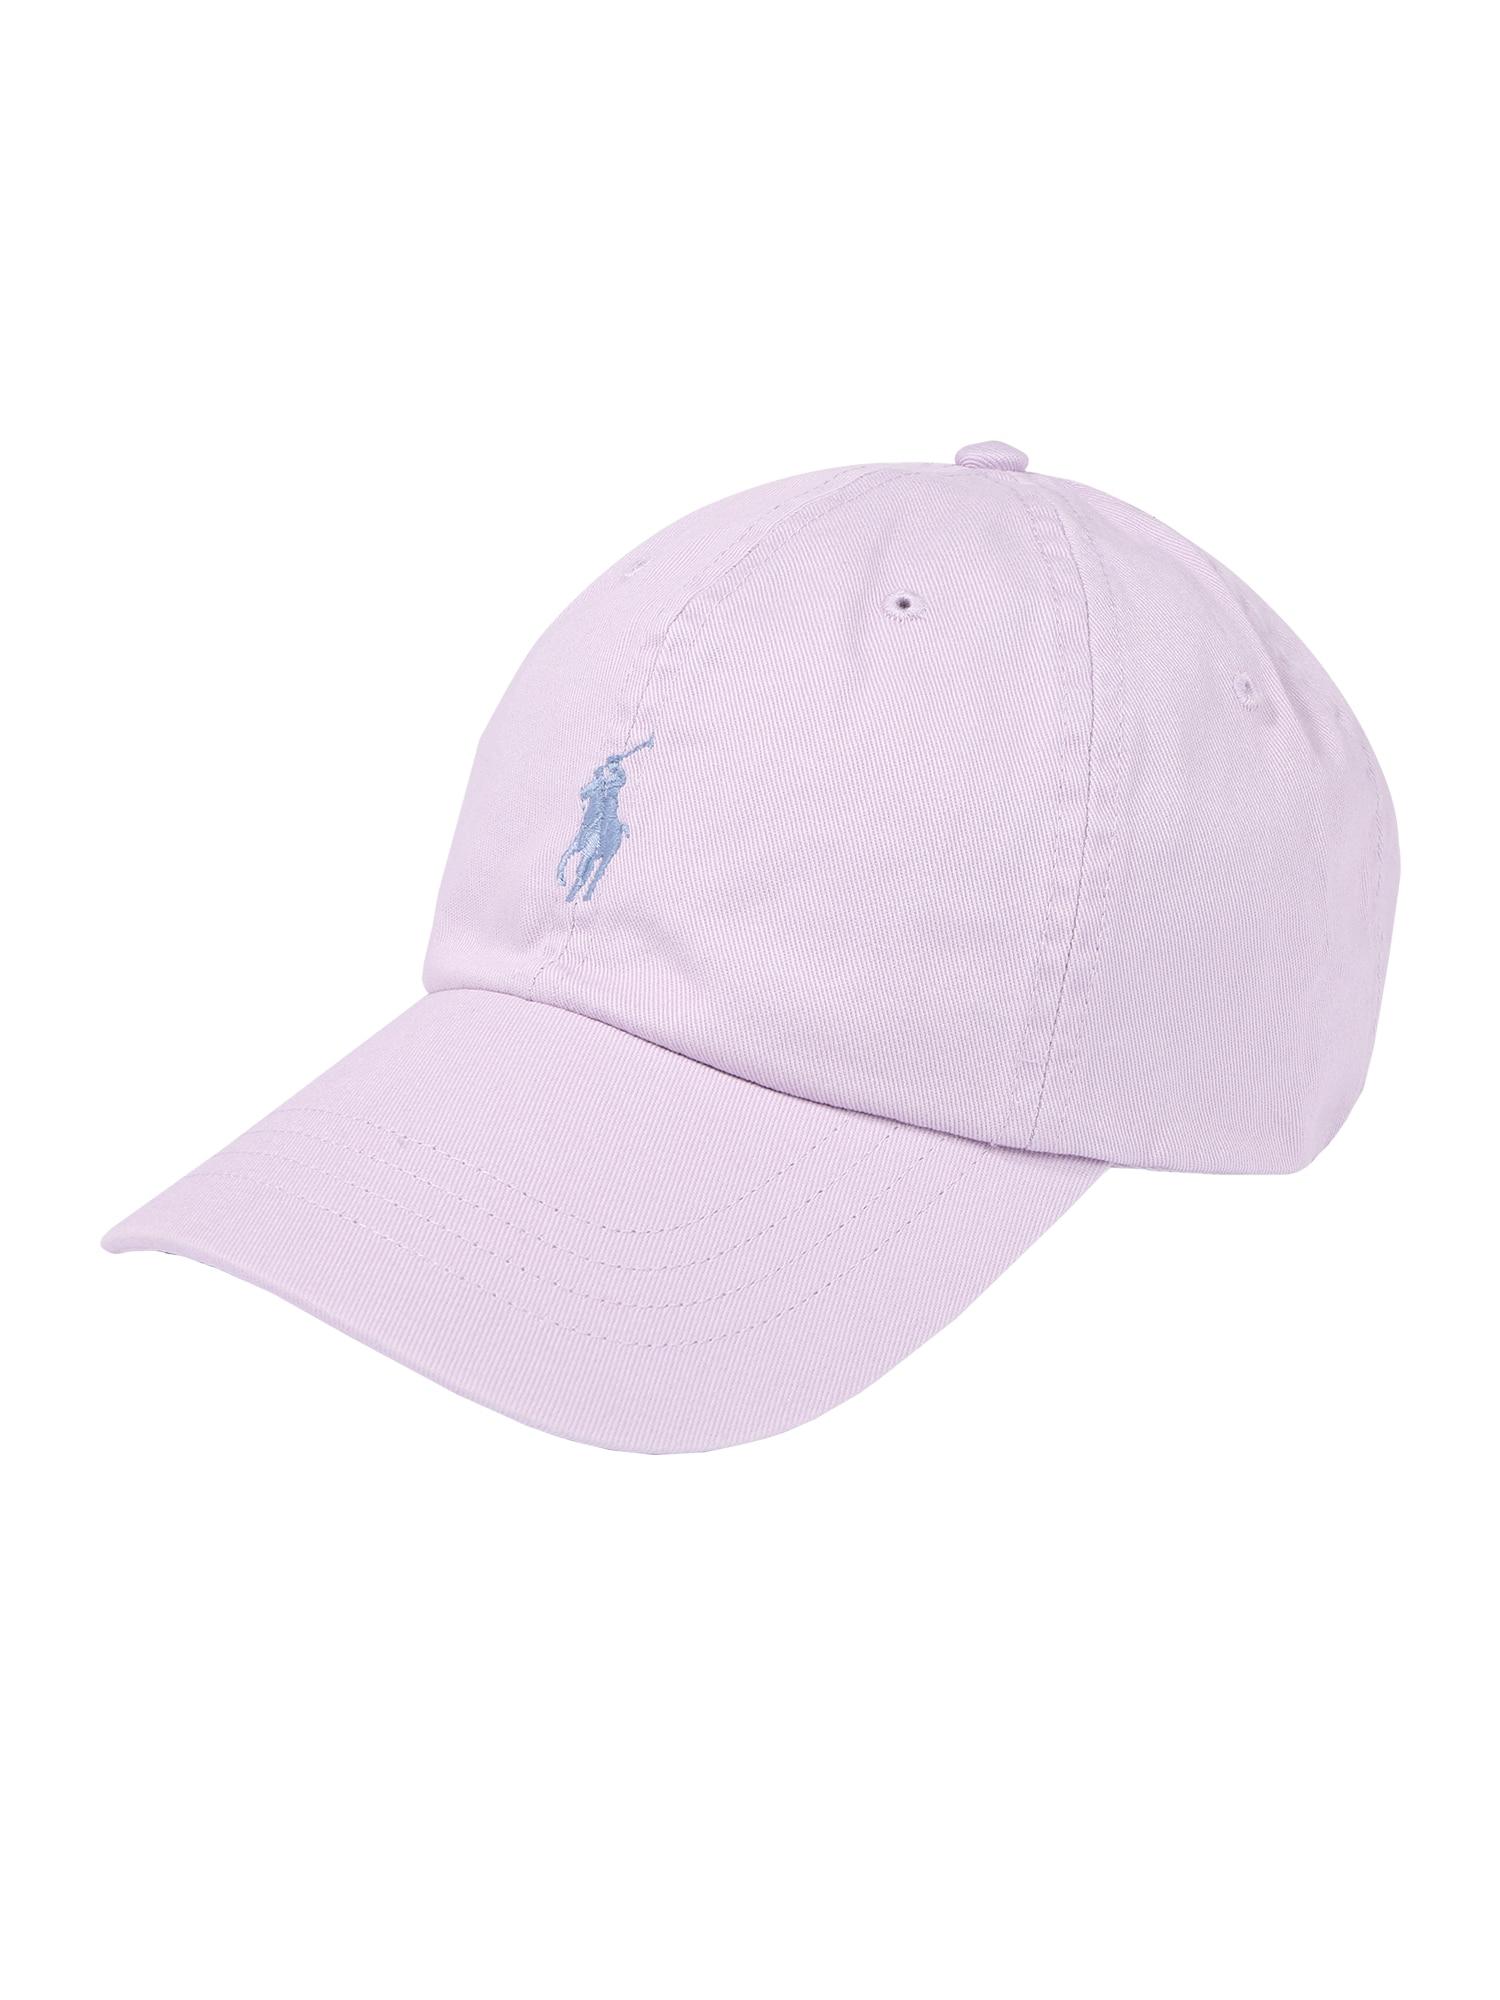 POLO RALPH LAUREN Športová šiltovka  svetlomodrá / ružová